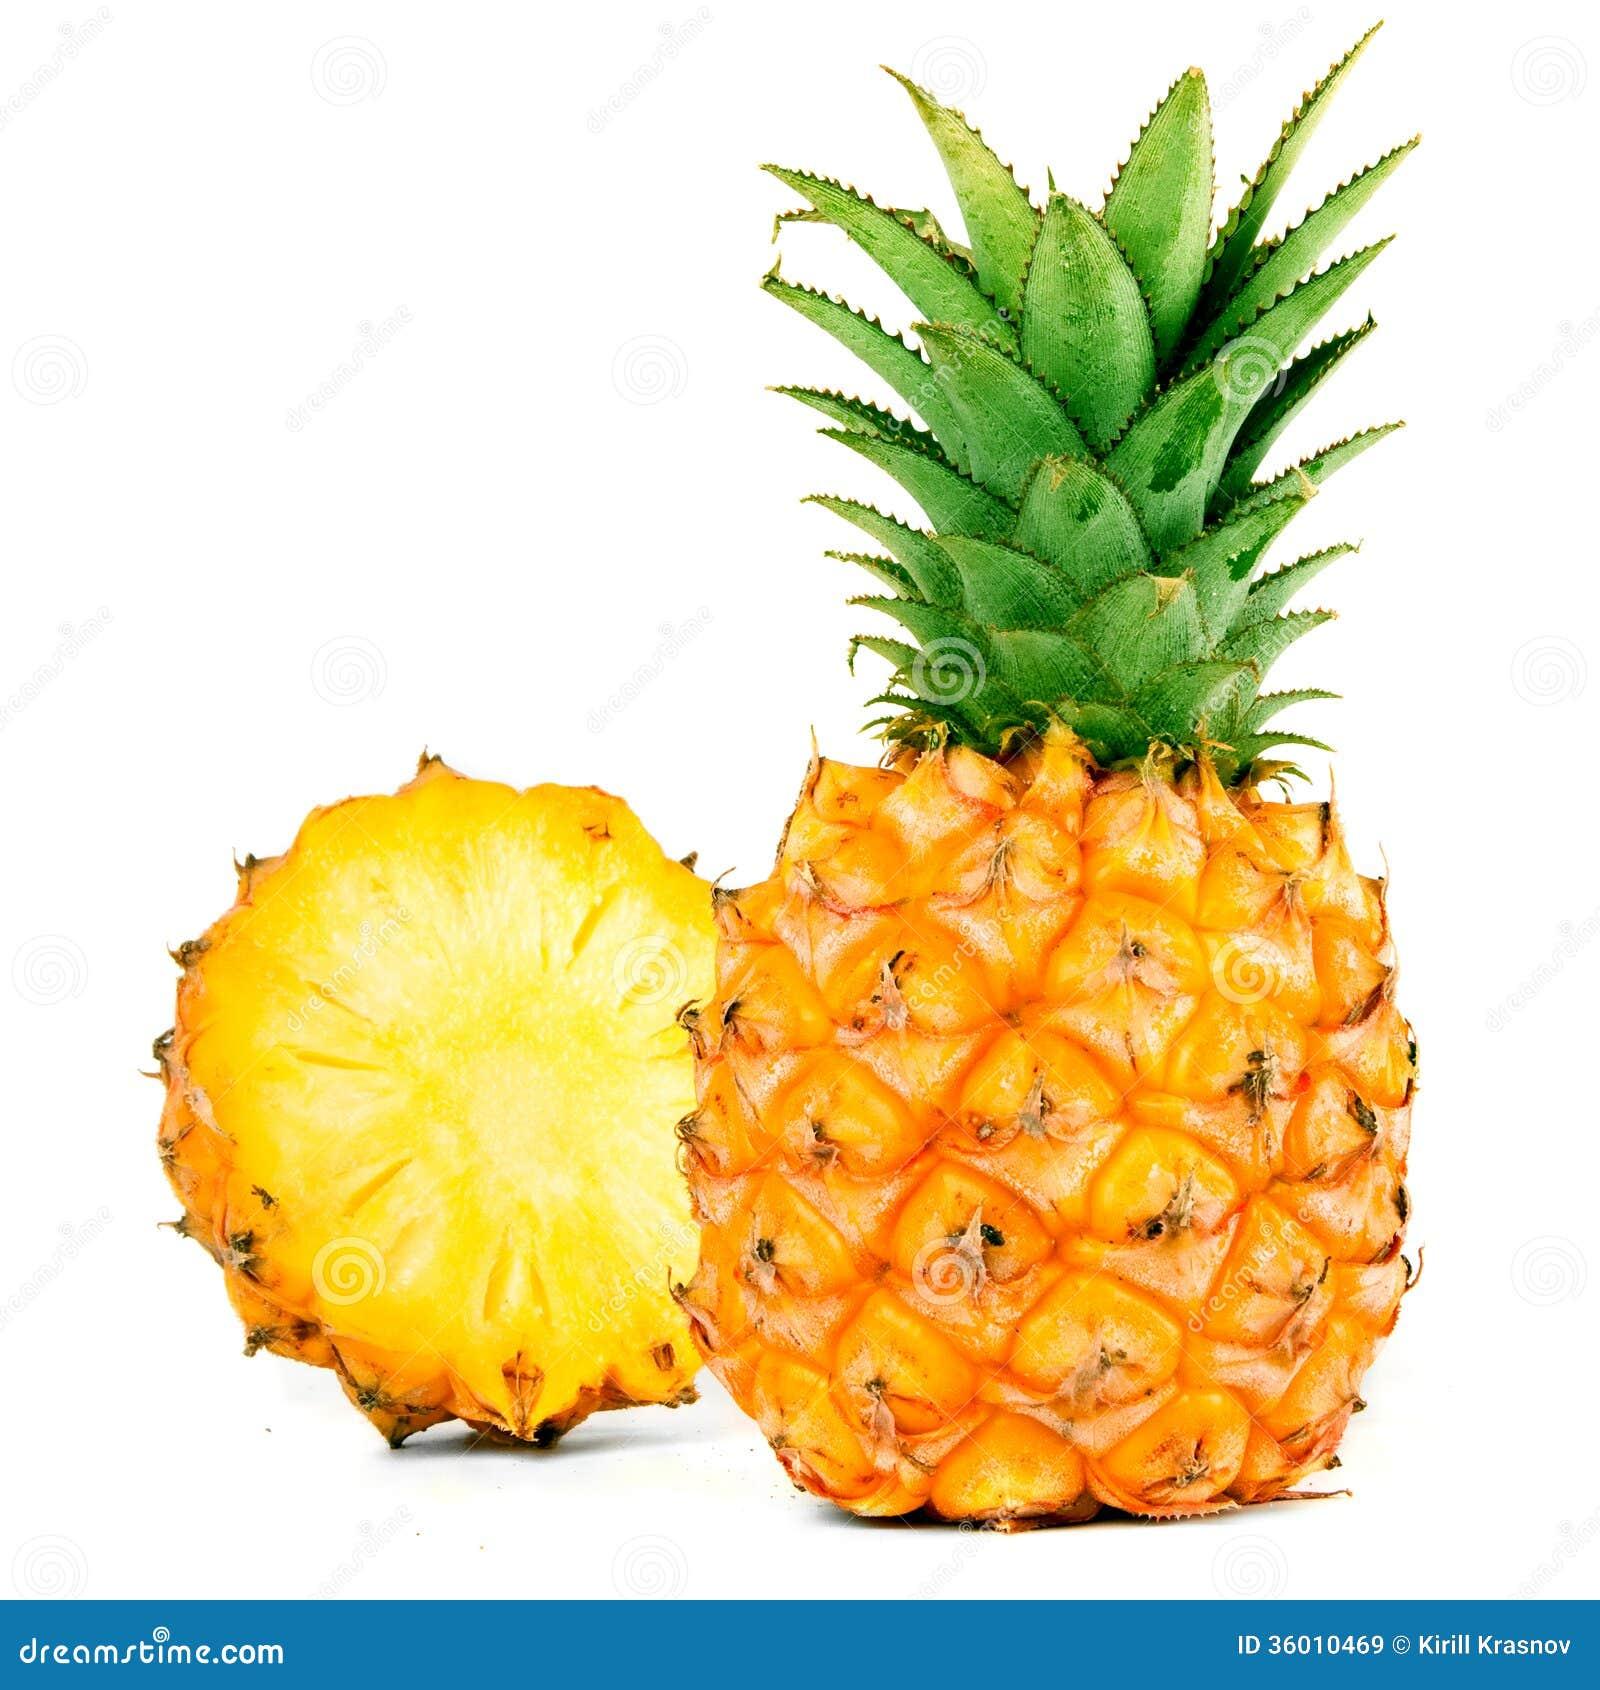 animated pineapple